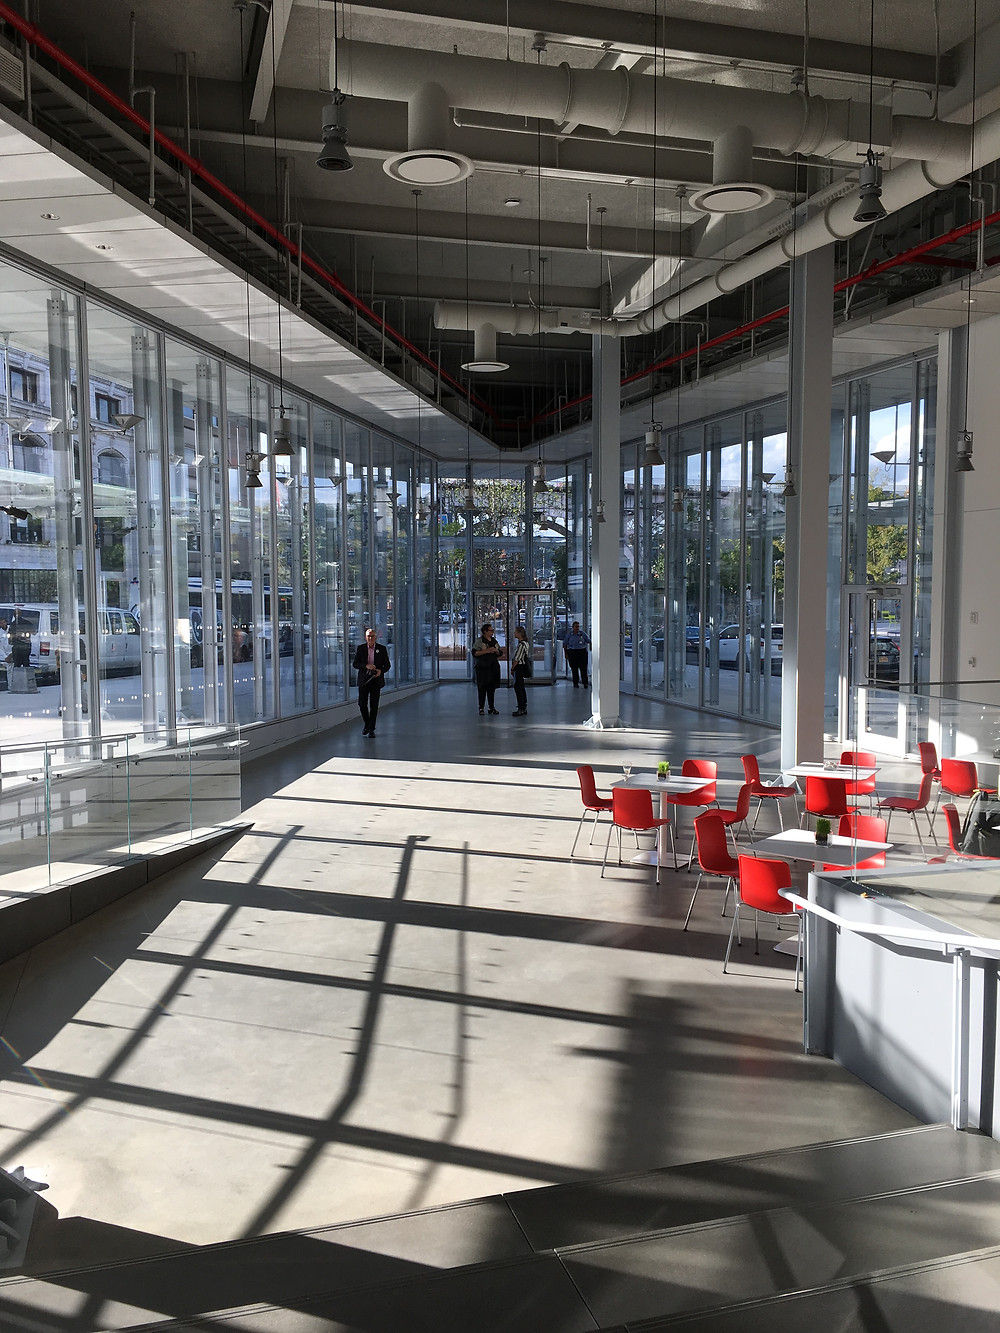 The ground floor of Renzo Piano's Forum is encased in glass